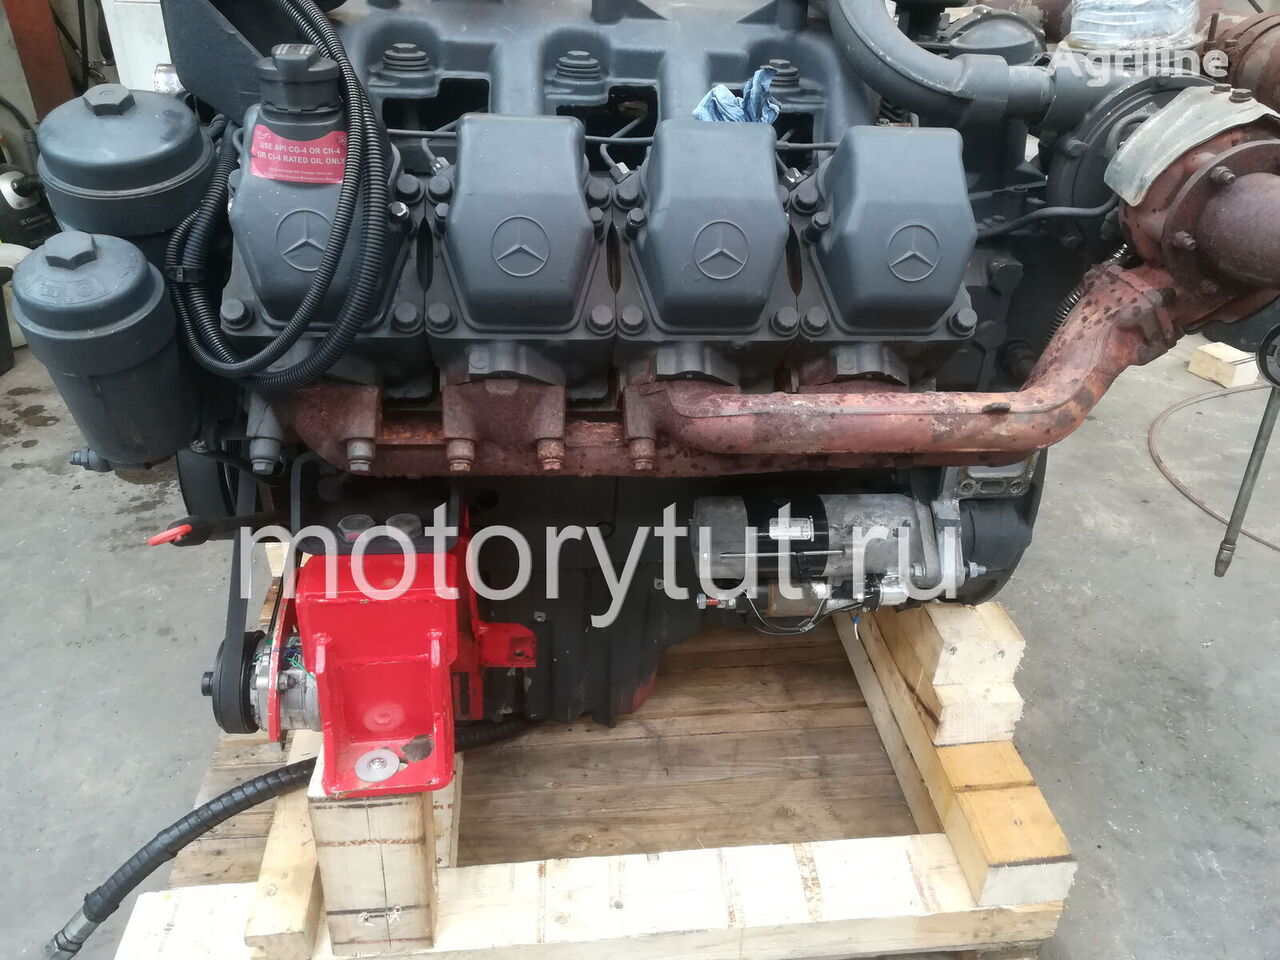 MERCEDES-BENZ OM 502 LA (942.992) engine for CLAAS grain harvester